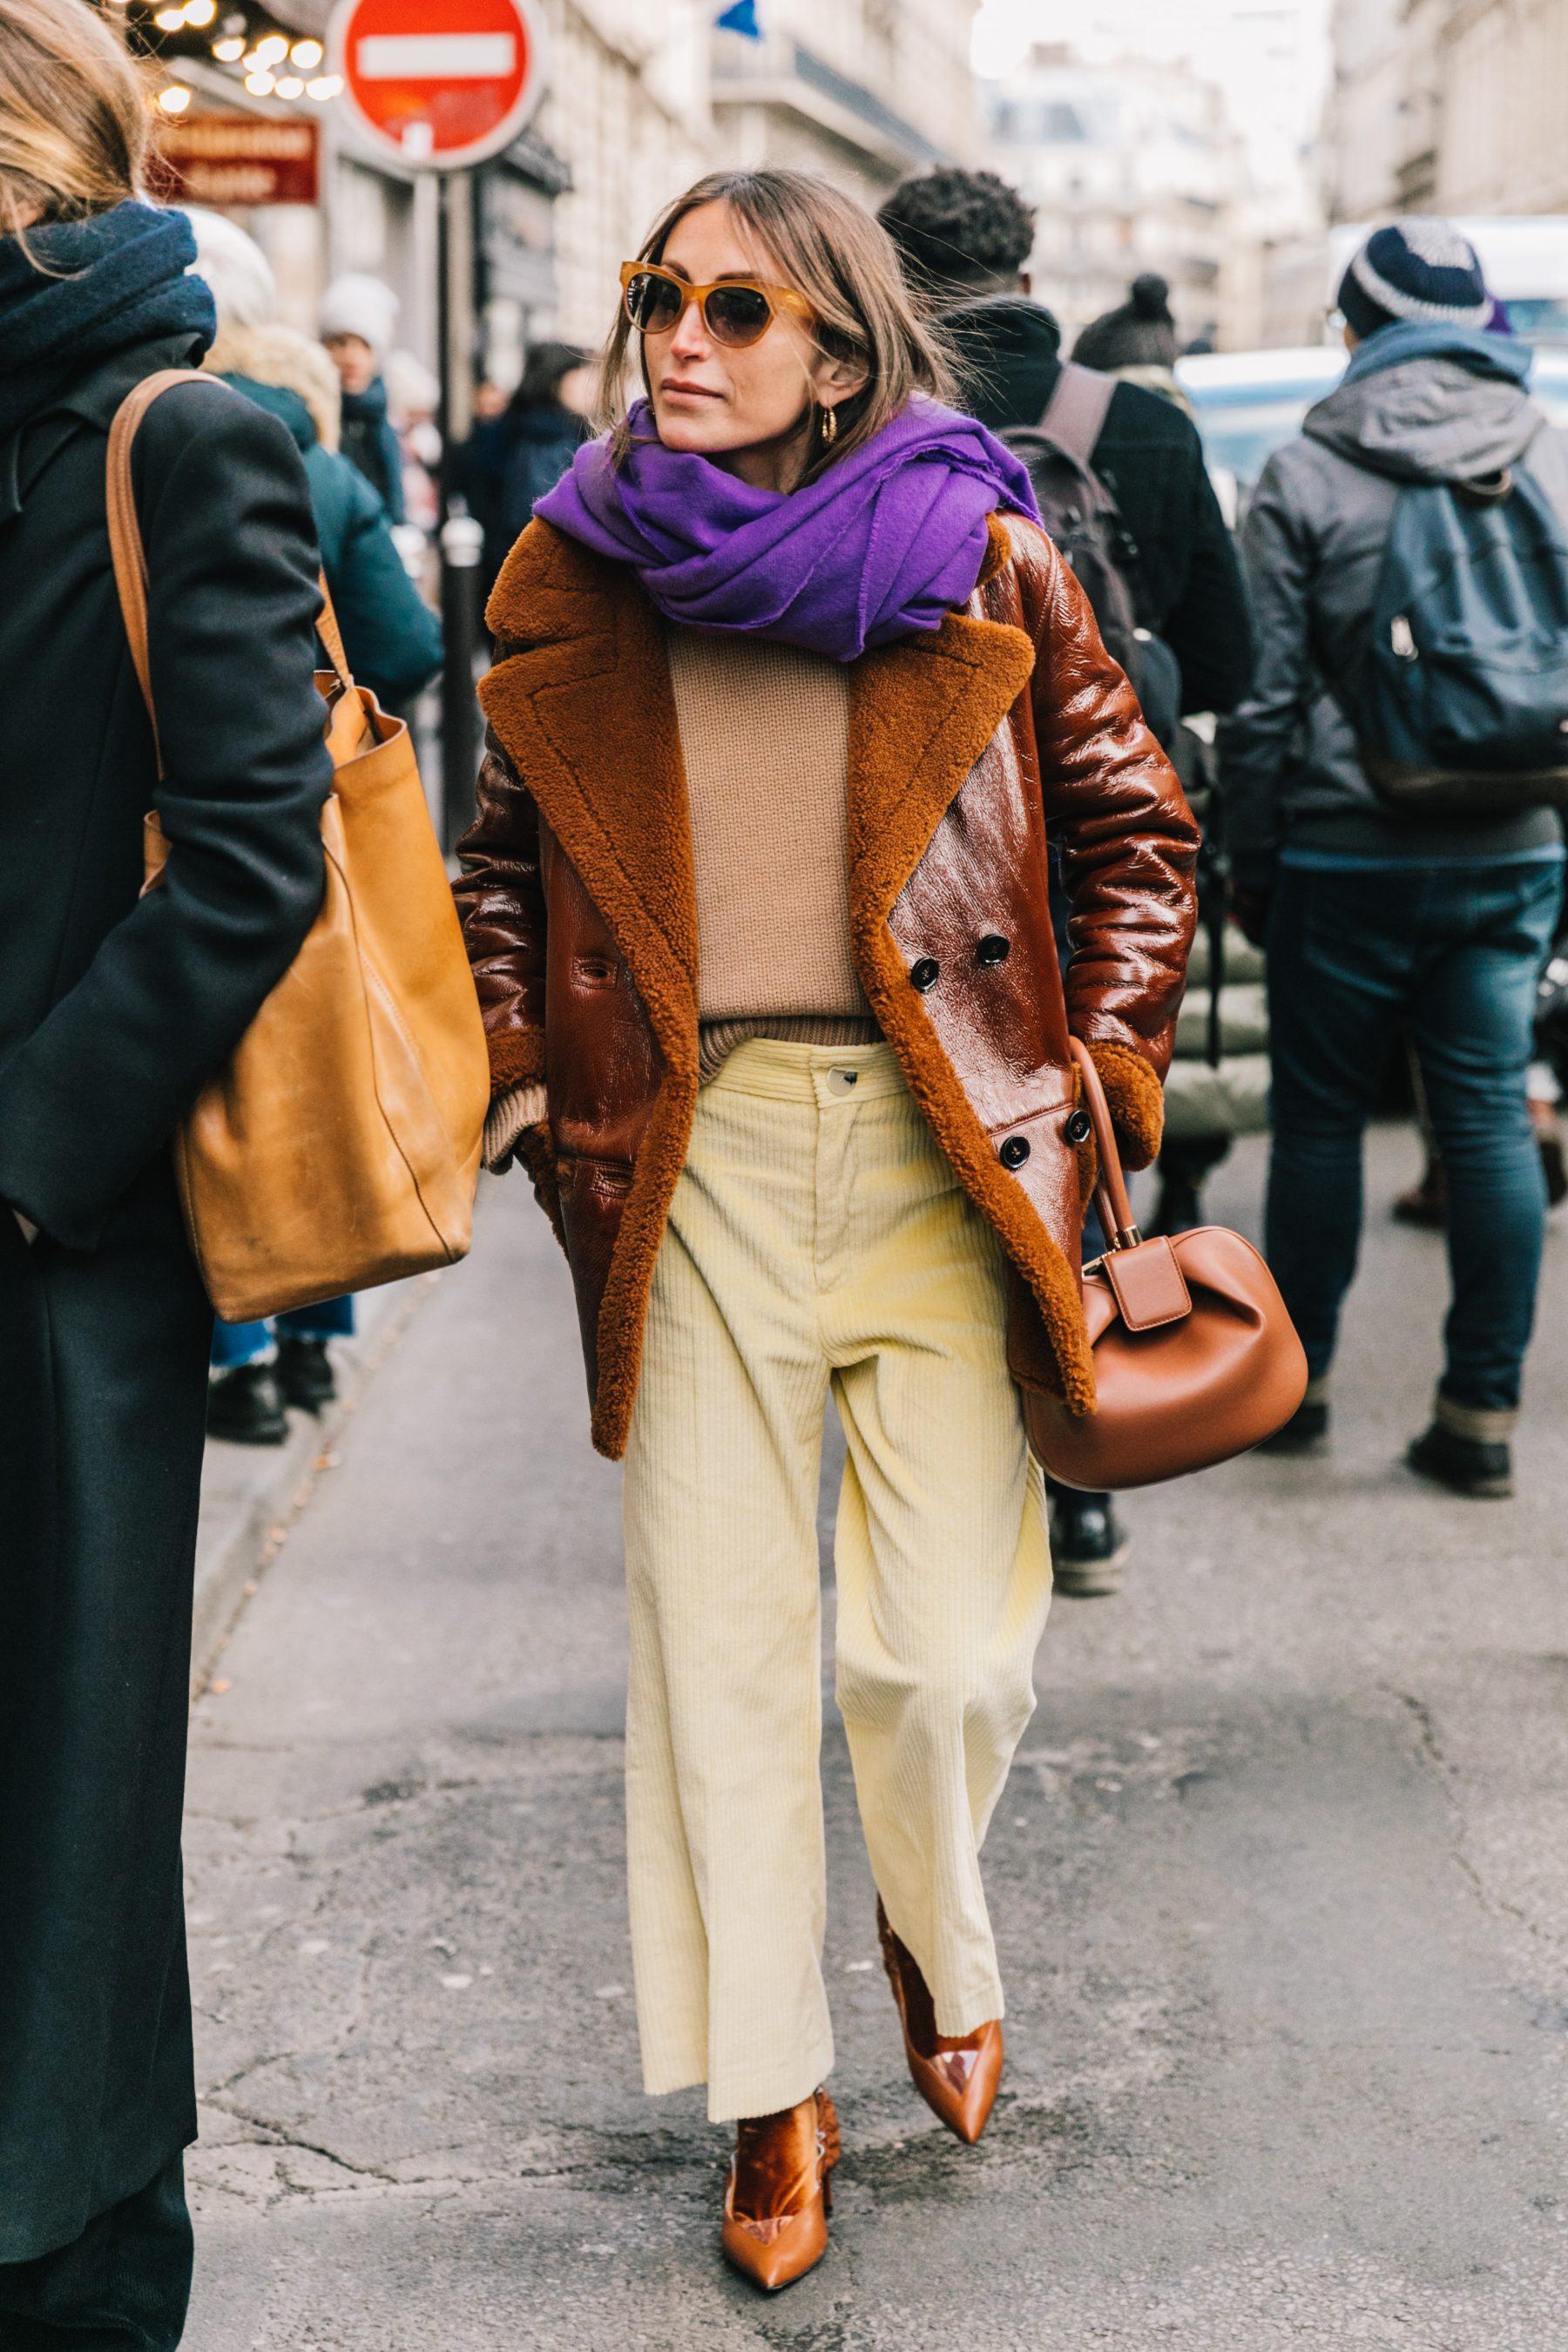 Paris Fall 18 19 Street Style I Collage Vintage